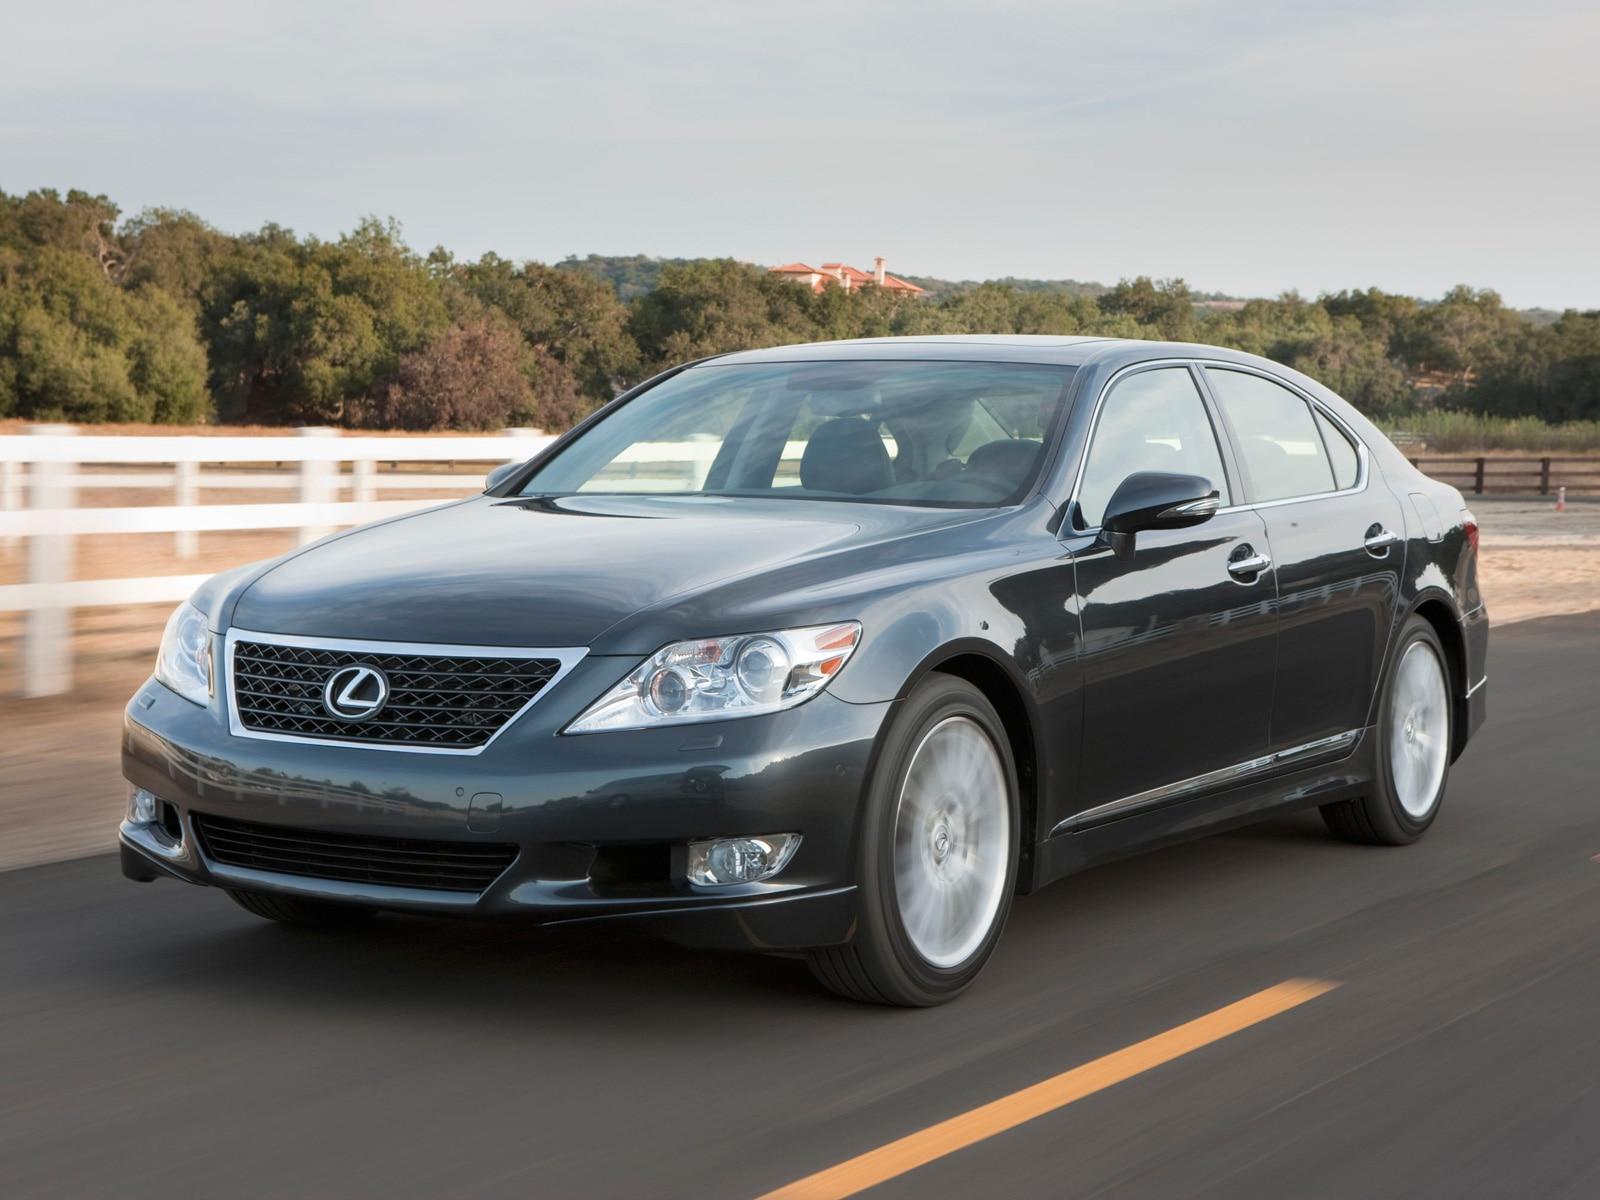 https://st.automobilemag.com/uploads/sites/11/2009/11/0911_09_z-2010_lexus_lS_460_sport-front_three_quarter_view.jpg